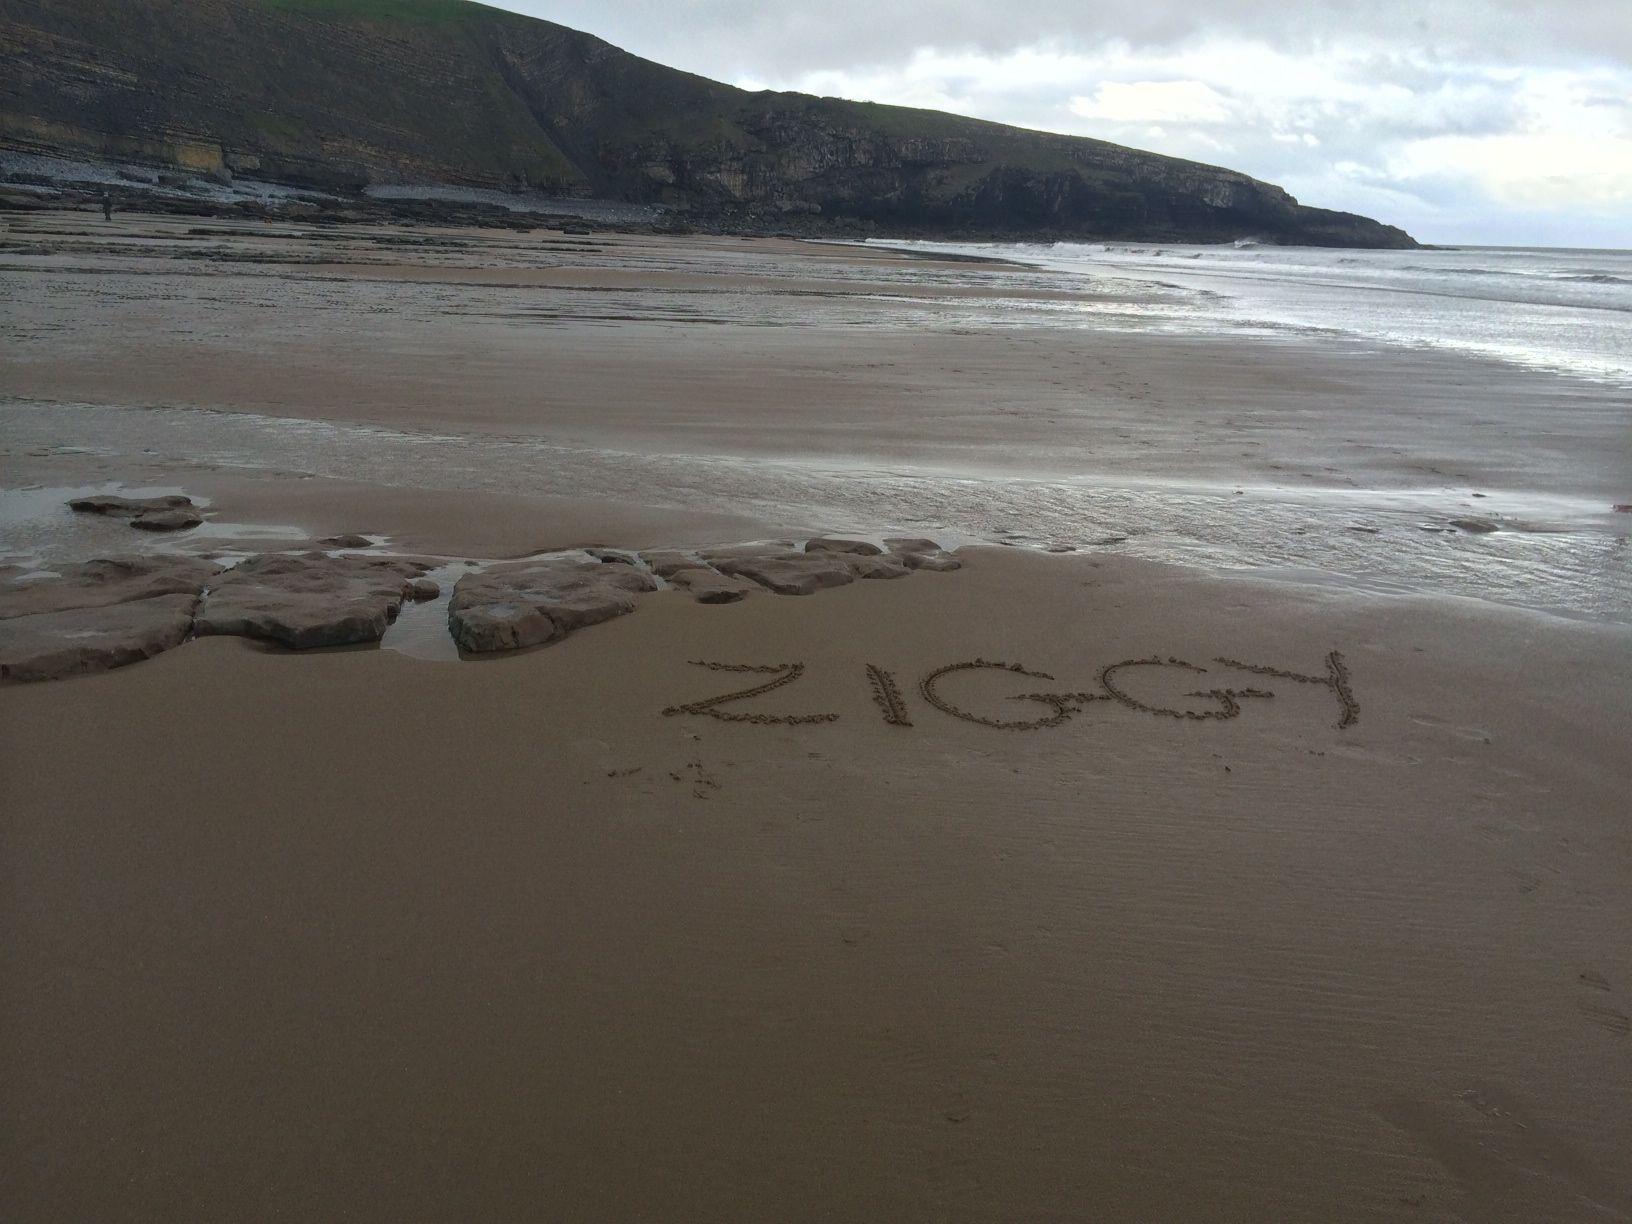 Beach photo Ziggy temporary memorial